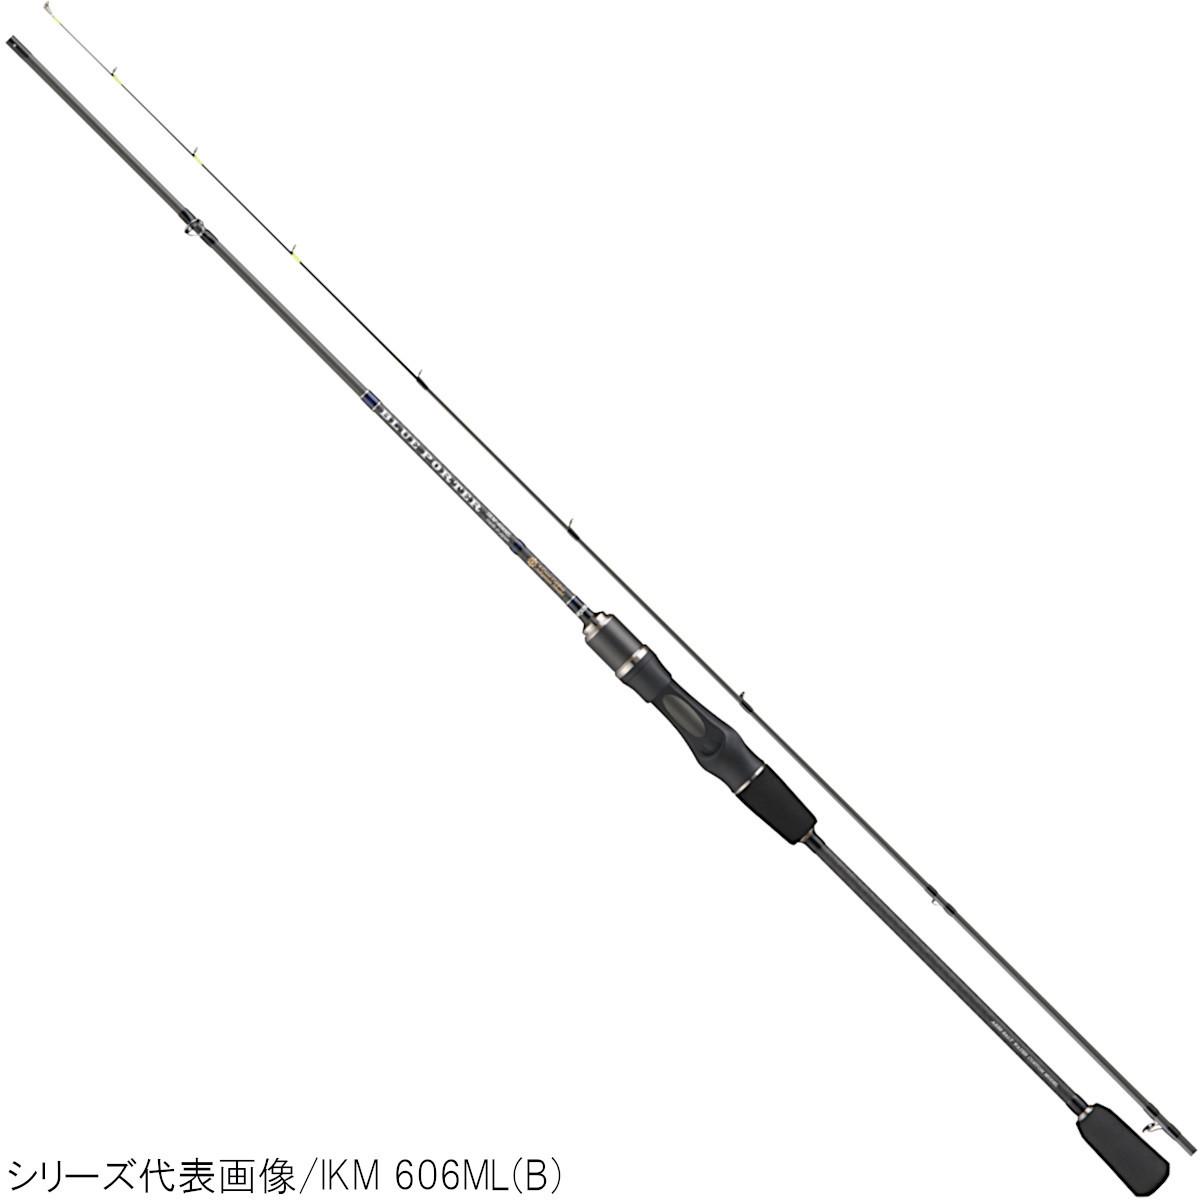 ARES ブルーポーター IKM 606MH 宇崎日新【同梱不可】